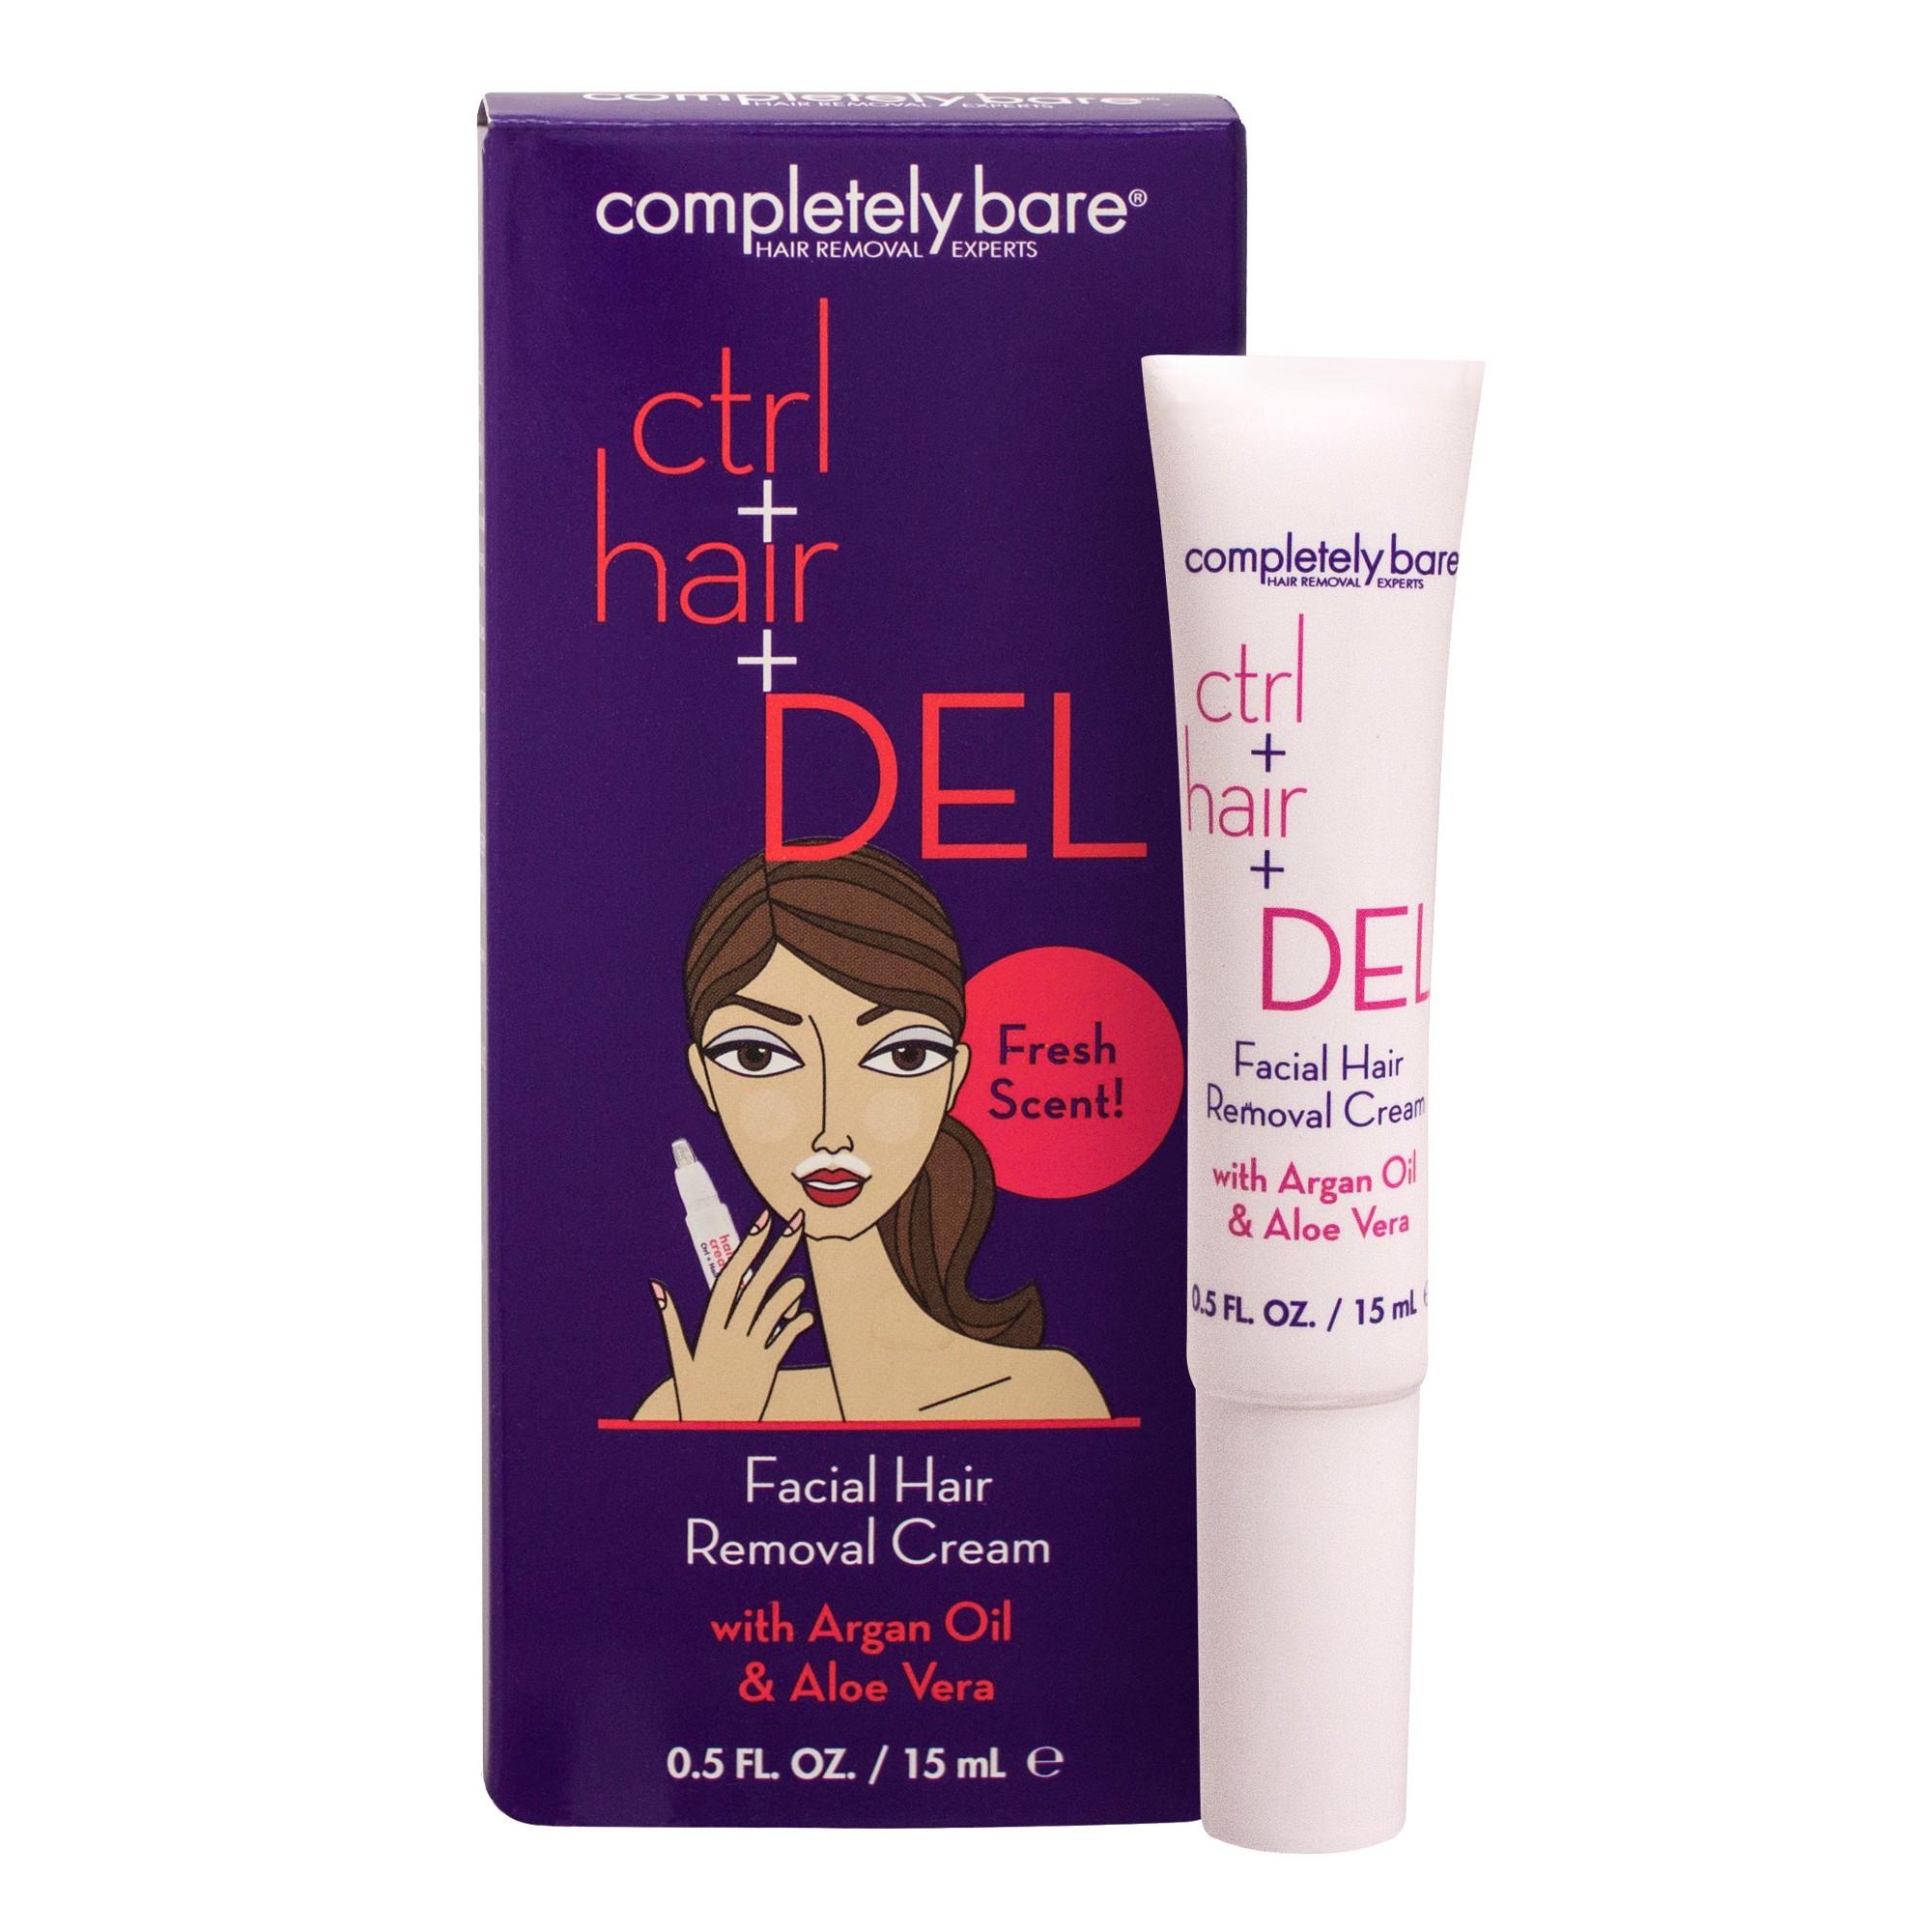 Completely Bare Facial Hair Removal Cream 0.5 oz, Women